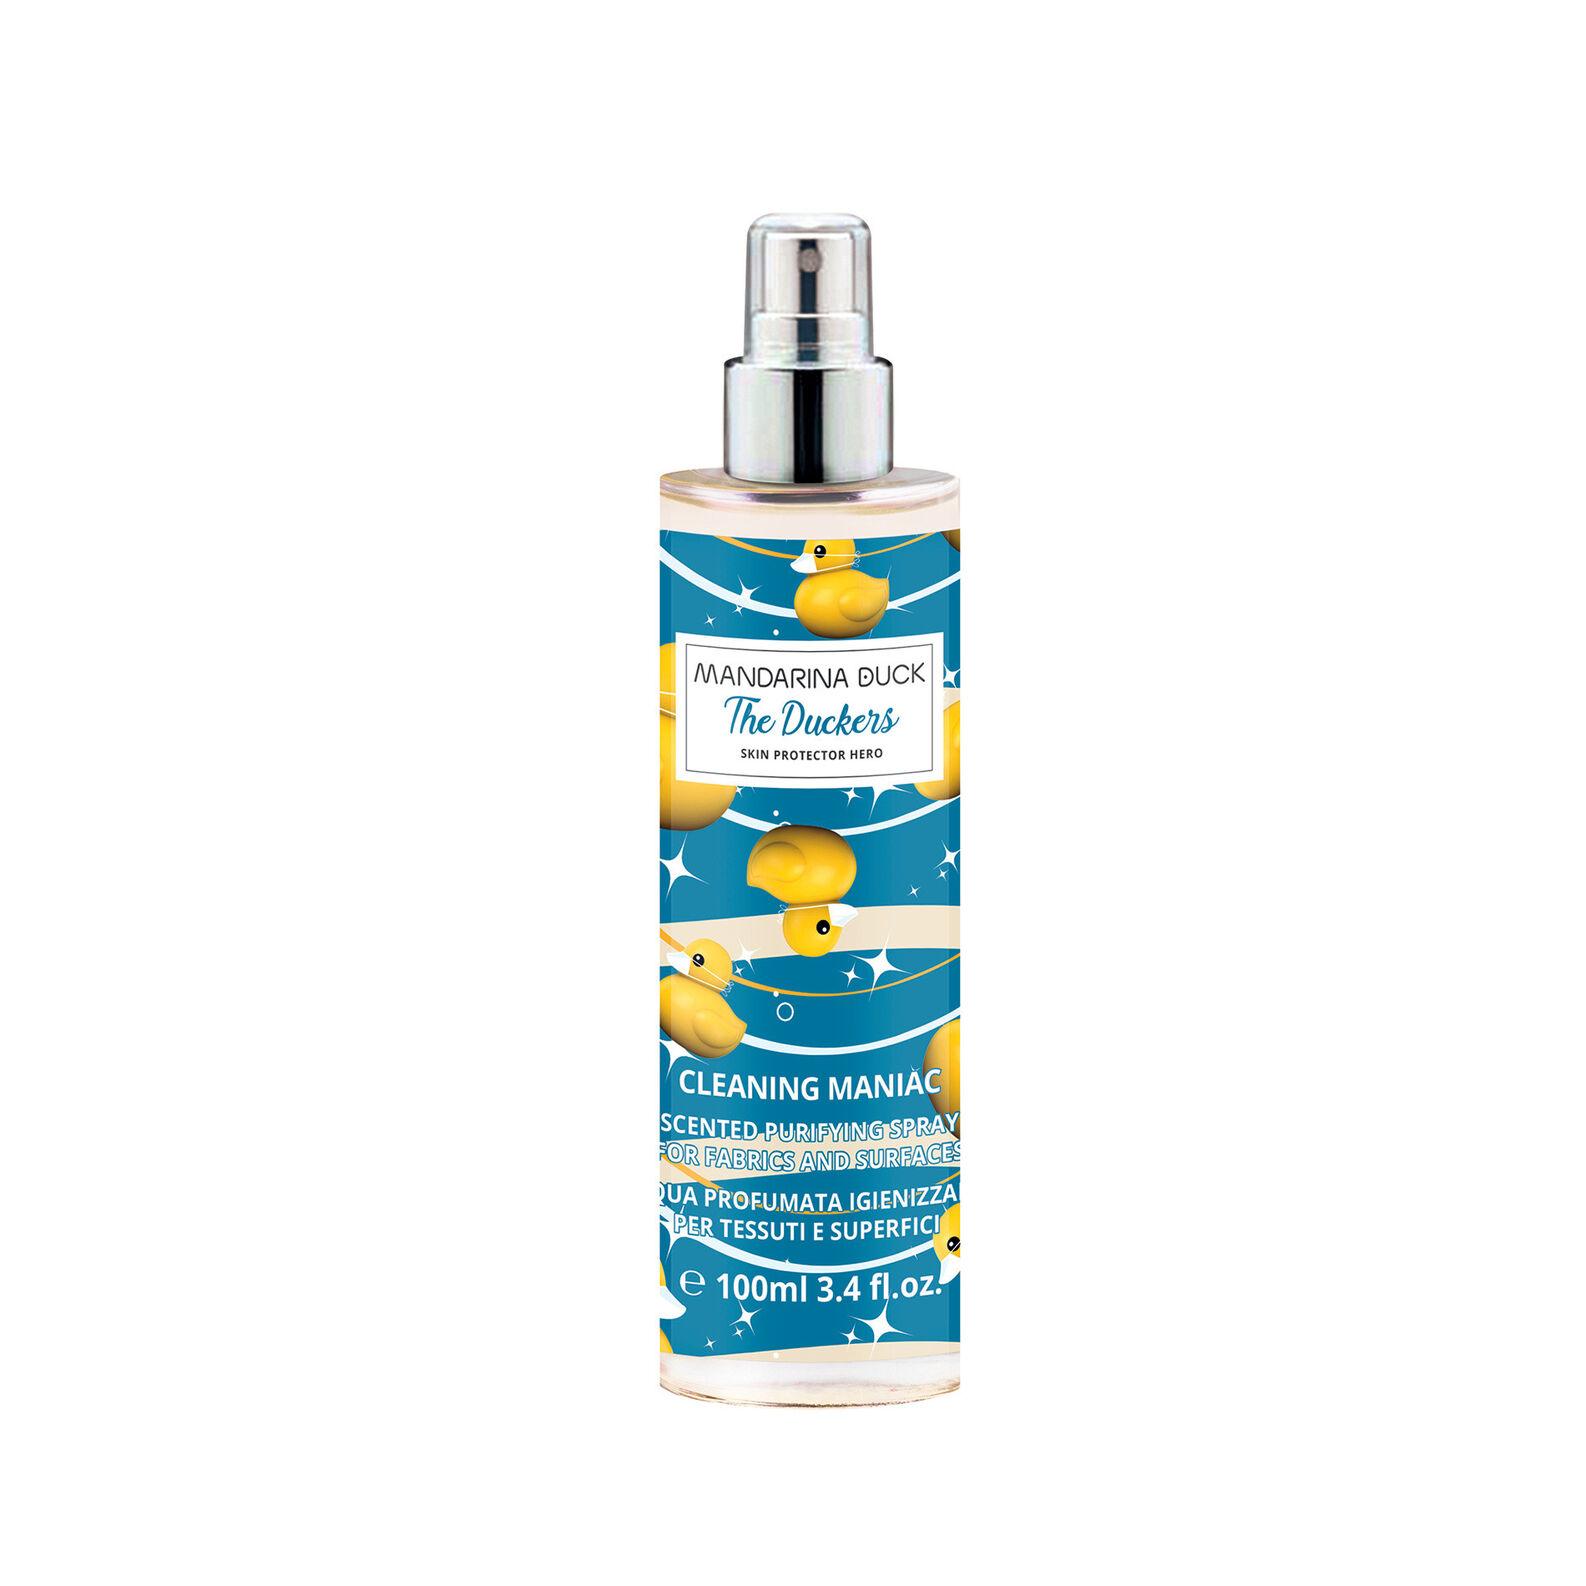 Sanitizing spray for fabrics and surfaces Mandarina Duck 100ml